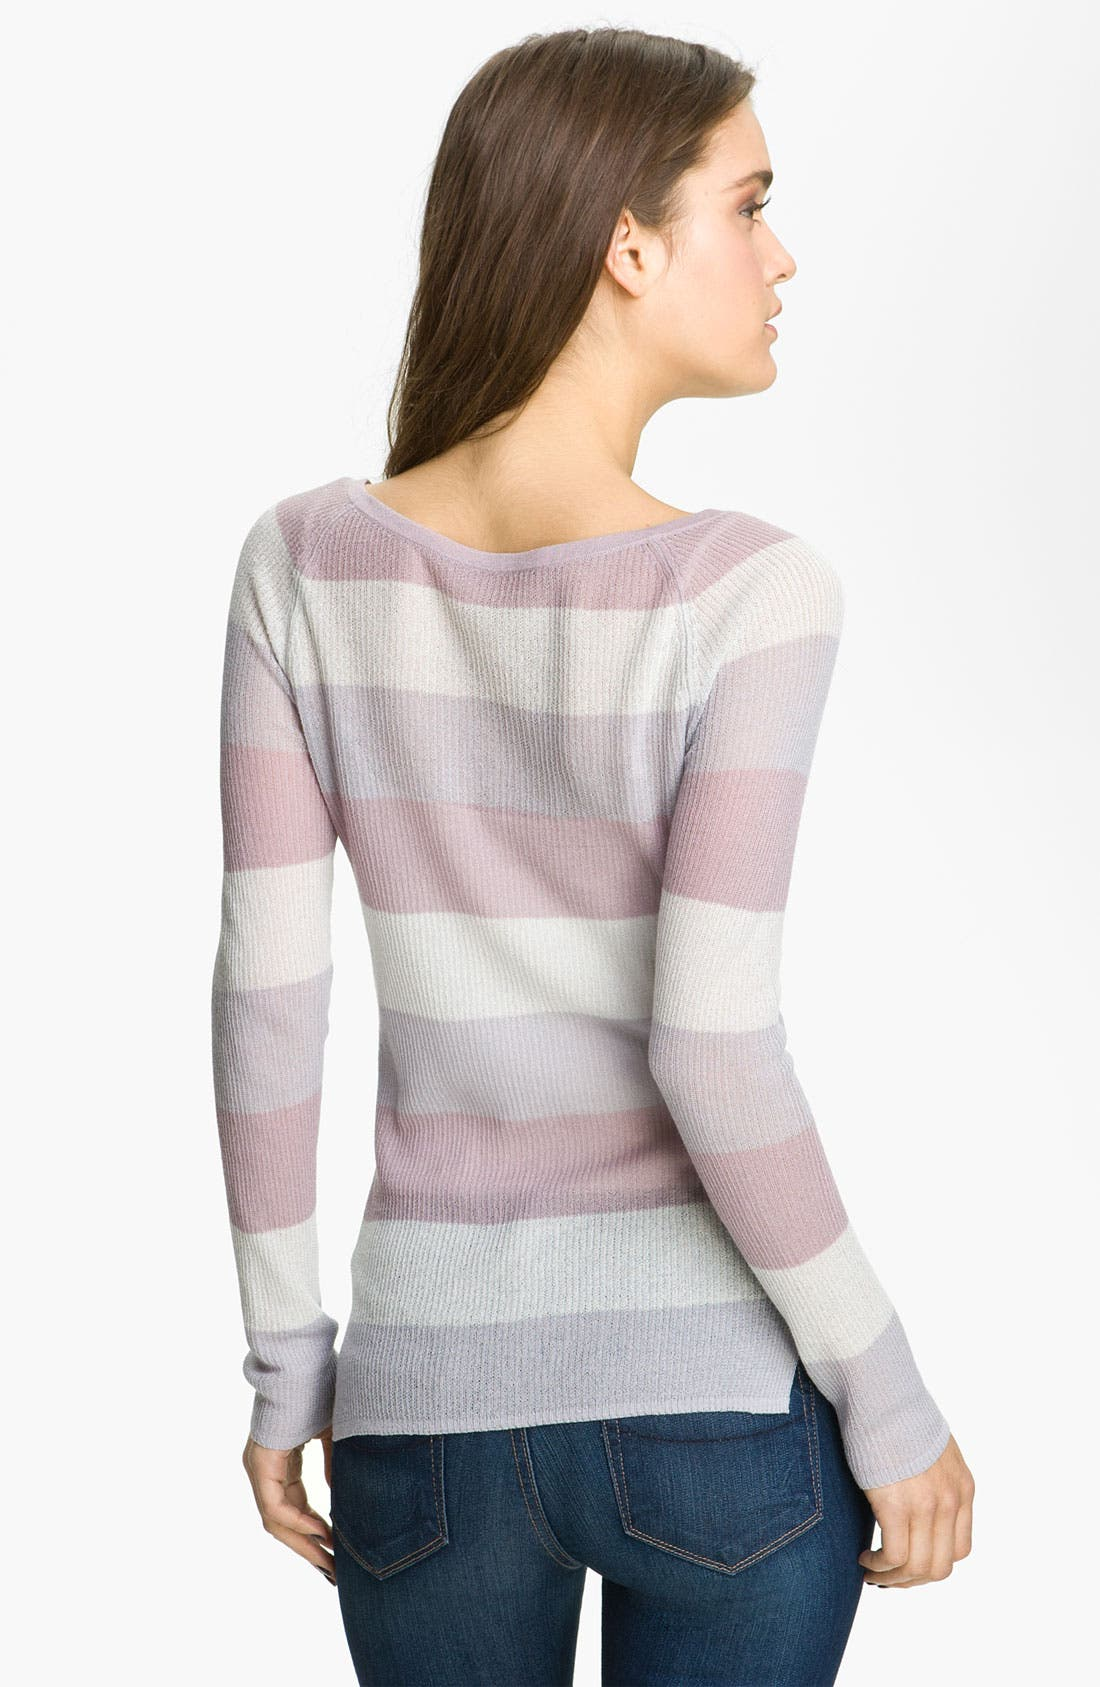 HINGE,  Stripe Knit Sweater, Alternate thumbnail 3, color, 060